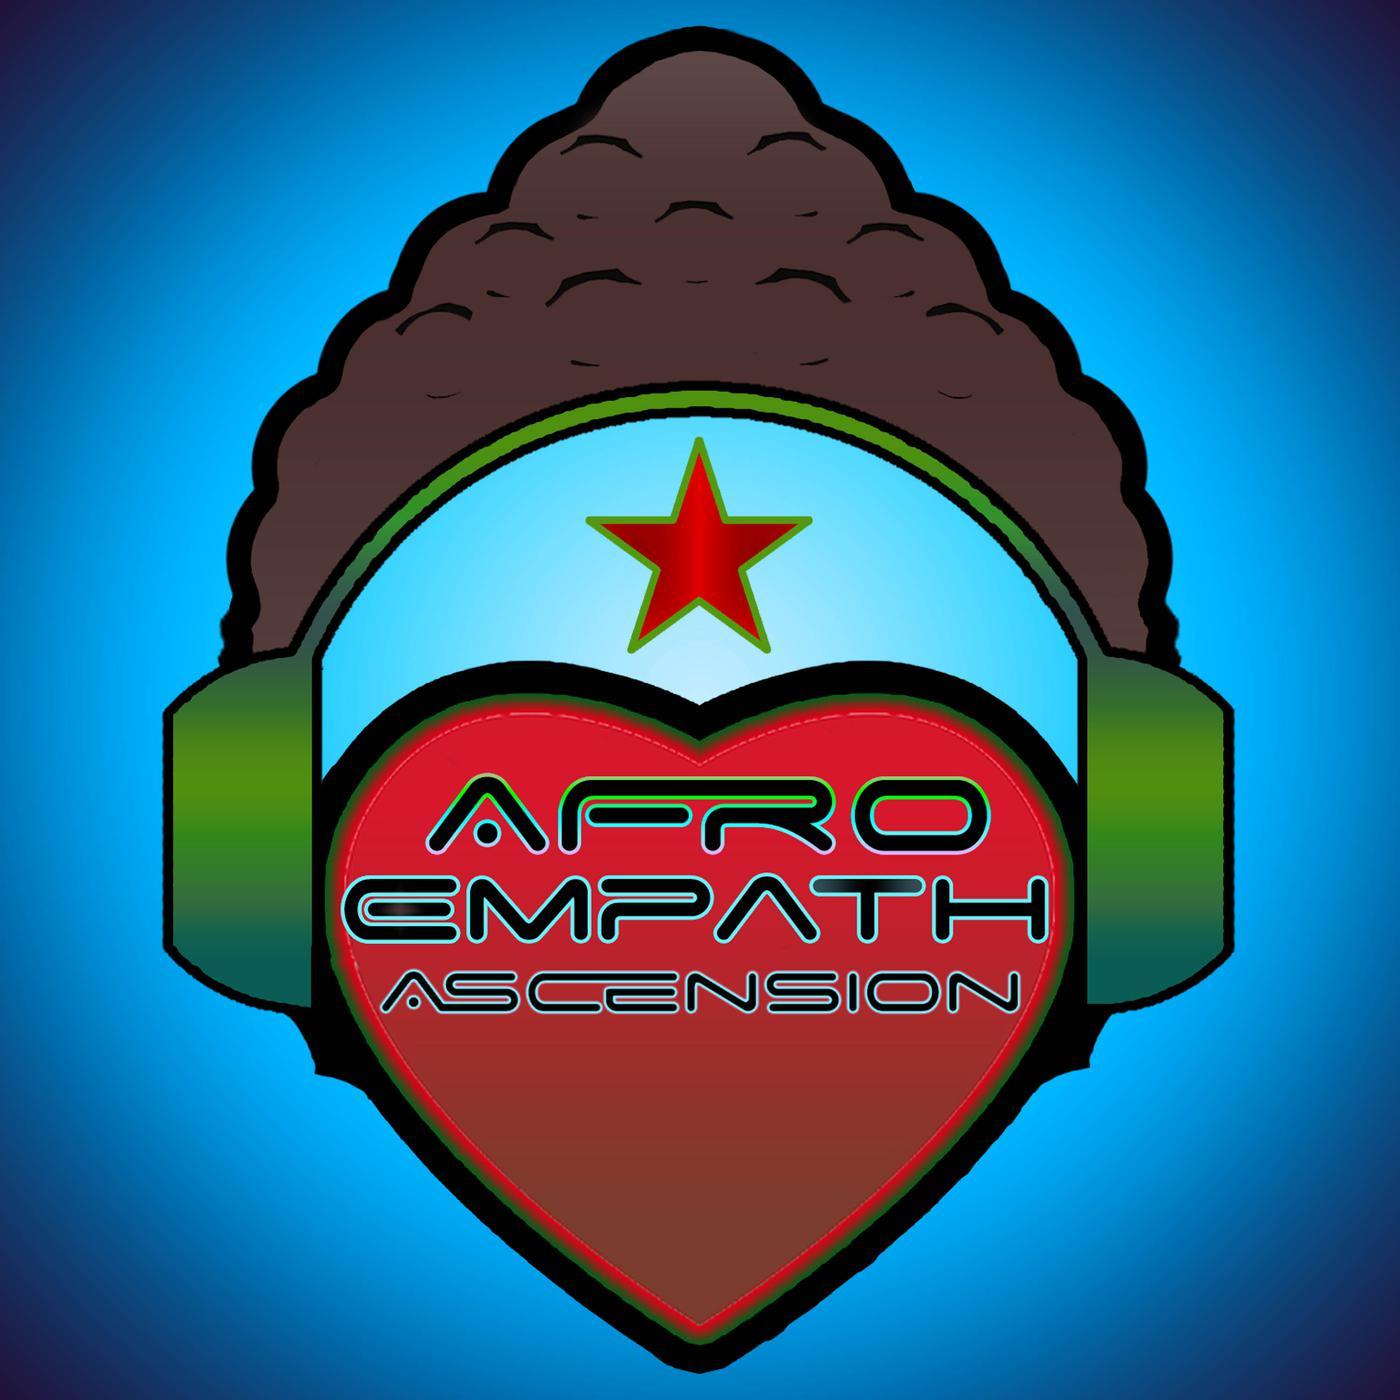 Afro Empath Ascension: Black Beyond Matter (podcast) - Bro